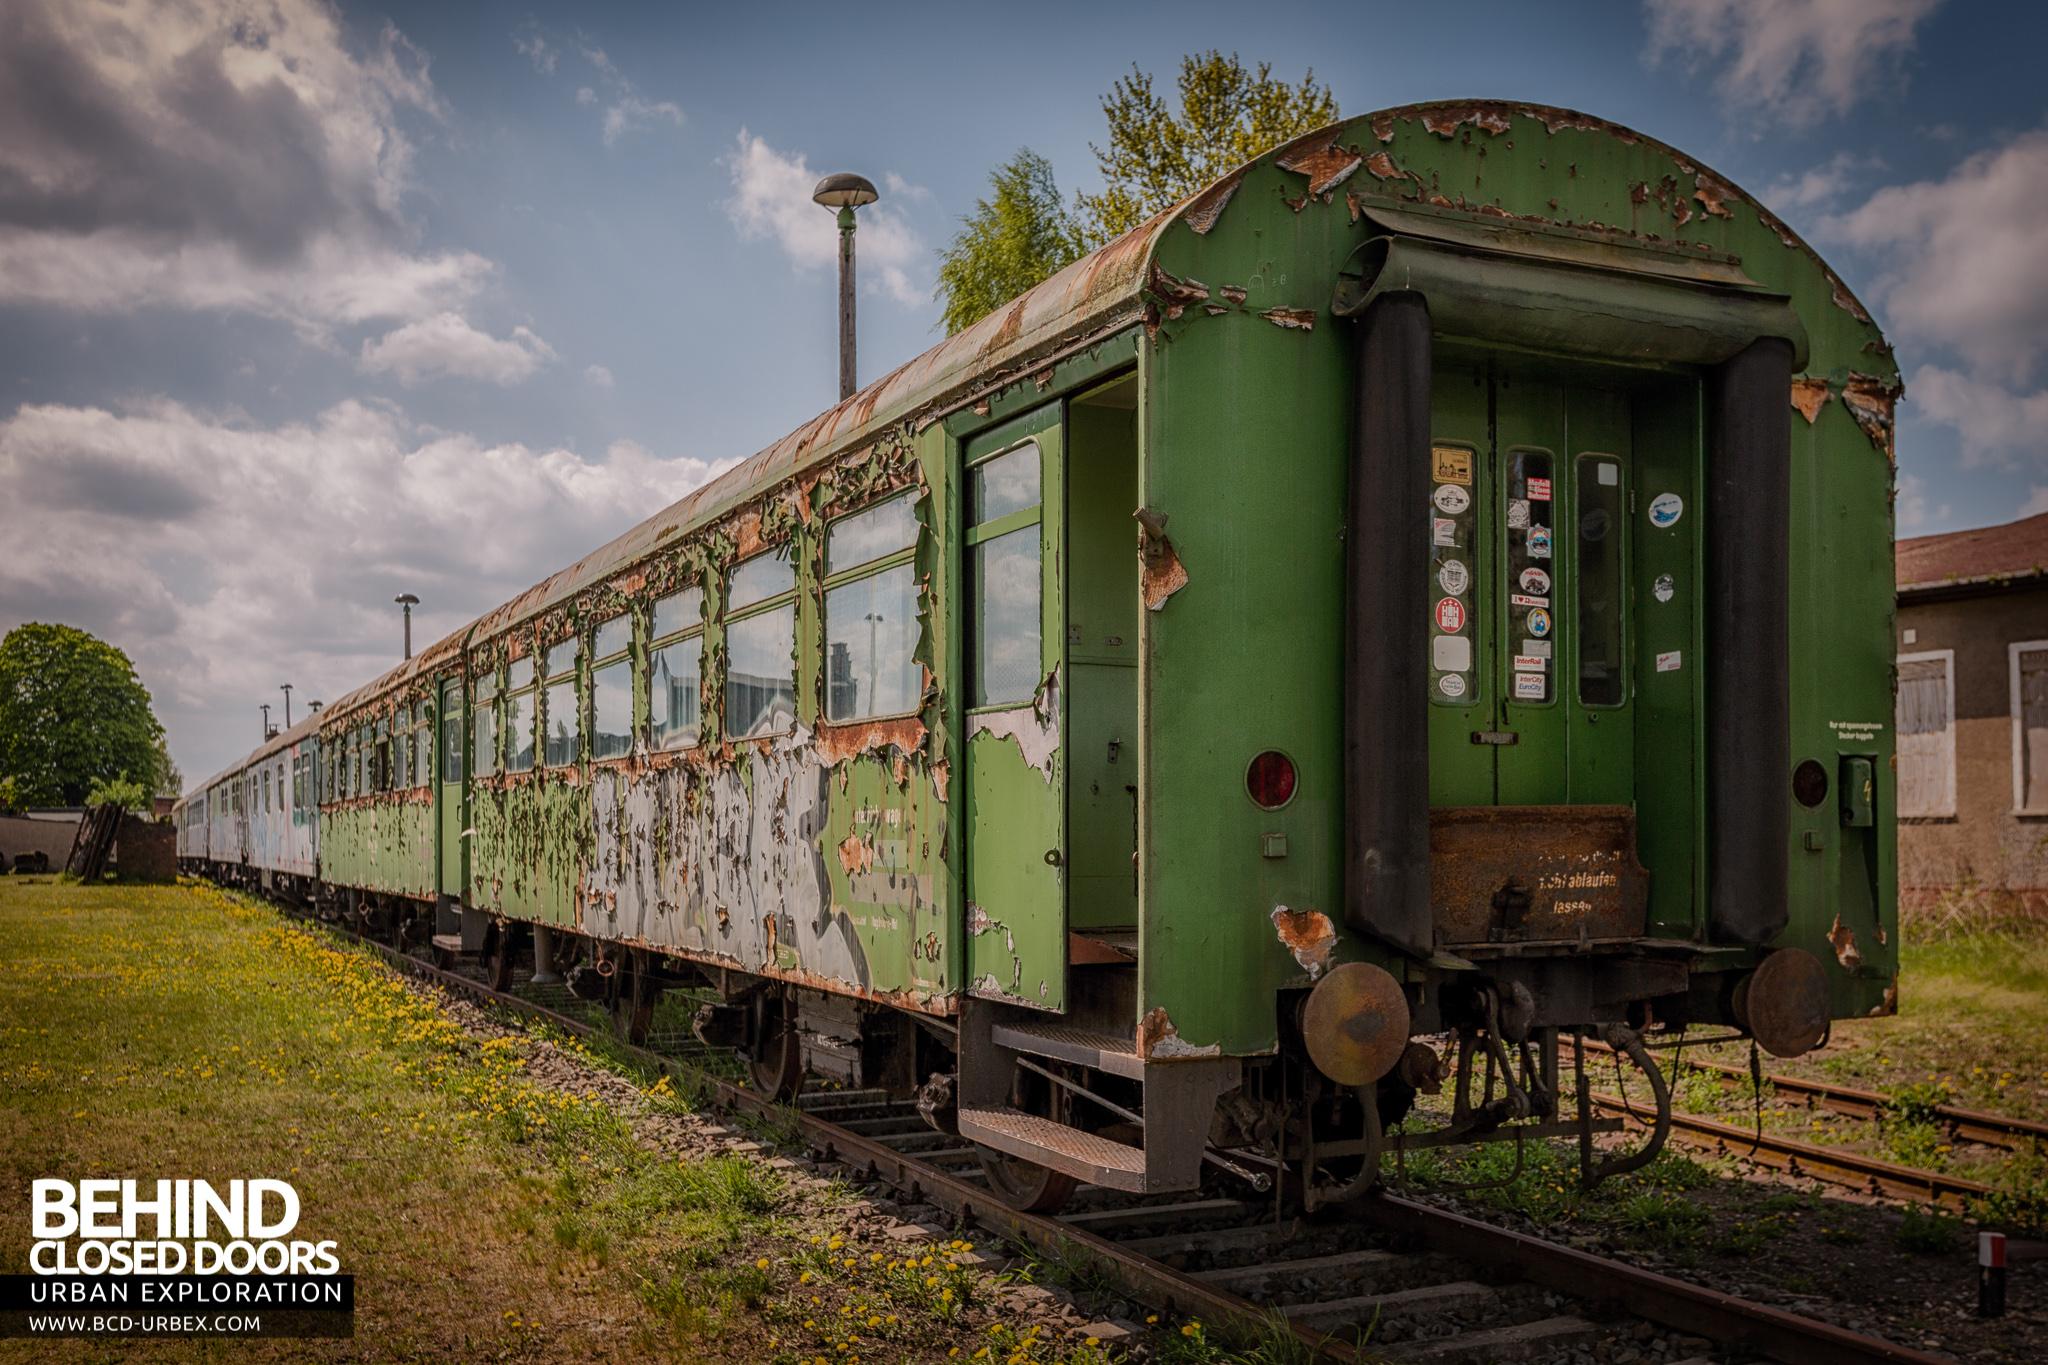 Medical Train Germany 187 Urbex Behind Closed Doors Urban